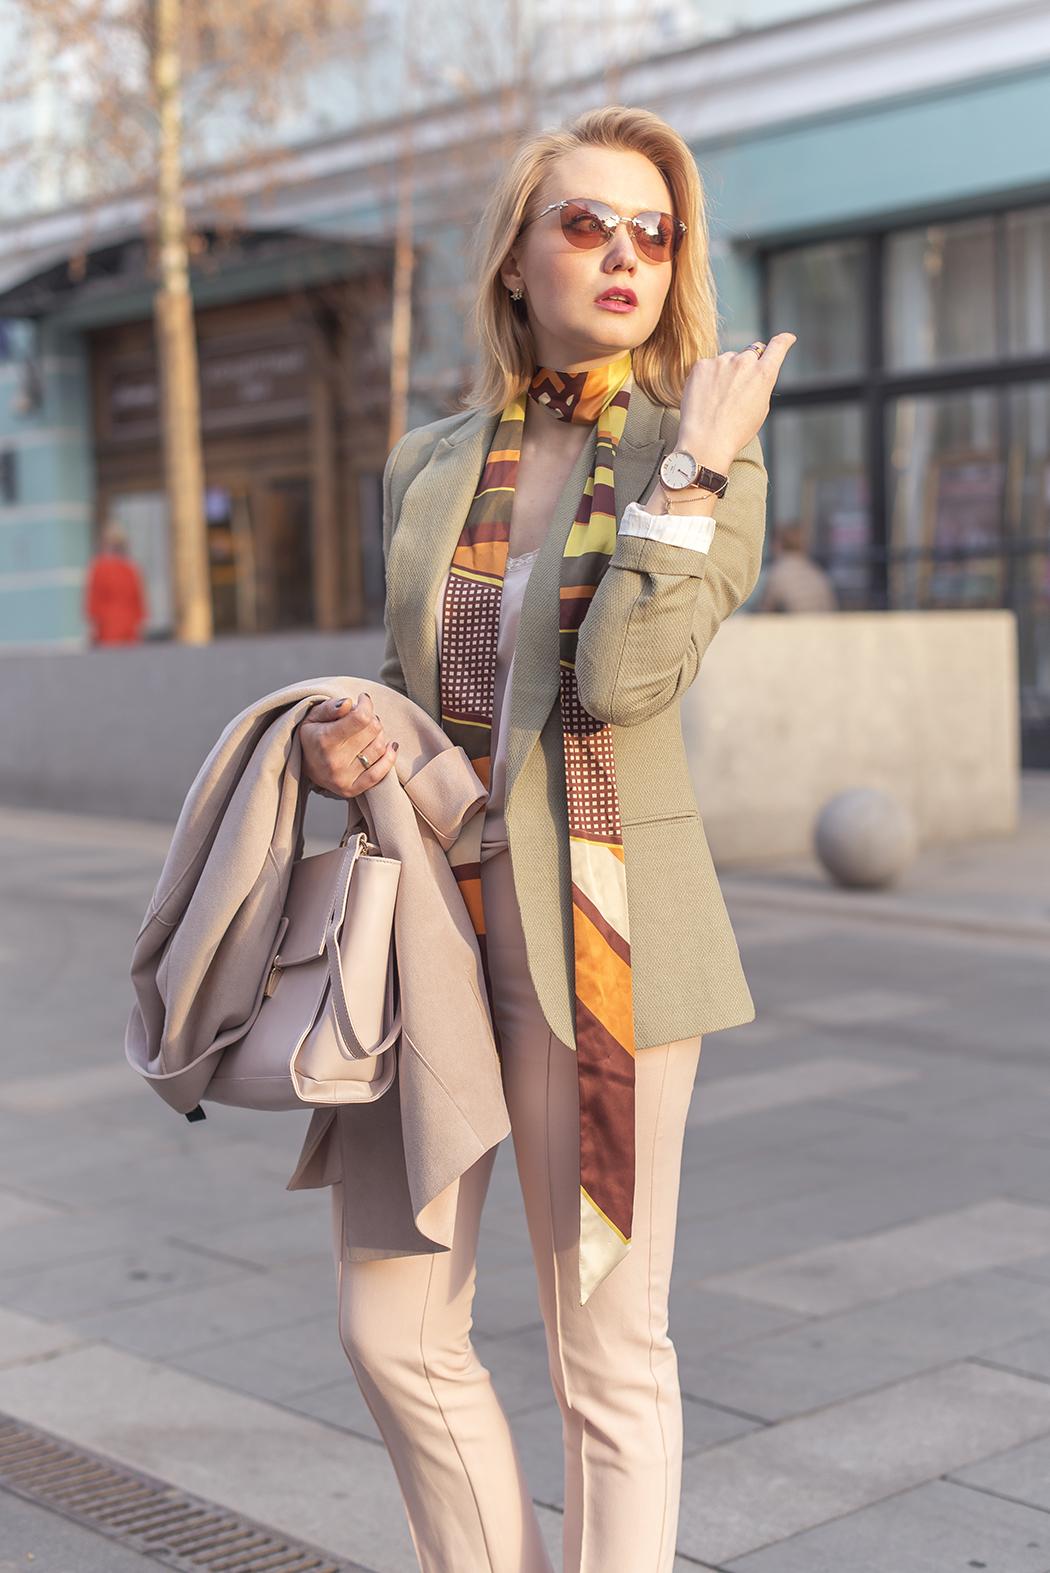 inspiration, streetstyle, spring outfit, annamidday, top fashion blogger, top russian fashion blogger, фэшн блогер, русский блогер, известный блогер, топовый блогер, russian bloger, top russian blogger, streetfashion, russian fashion blogger, blogger, fashion, style, fashionista, модный блогер, российский блогер, ТОП блогер, ootd, lookoftheday, look, популярный блогер, российский модный блогер, russian girl, пастельная одежда, с чем носить пастельную одежду, как сочетать пастельные цвета, pastel colors, pastel colors combination, цветовые сочетания, next, next.com.ru, streetstyle, красивая девушка, pastel coat, pastel jacket, pastel pants, pastel loafers, tiffany sunglasses, Анна миддэй, анна мидэй, marc cain fun velour coat, pastel outfit, pantone 2016, rose quartz, serenity, lilac grey